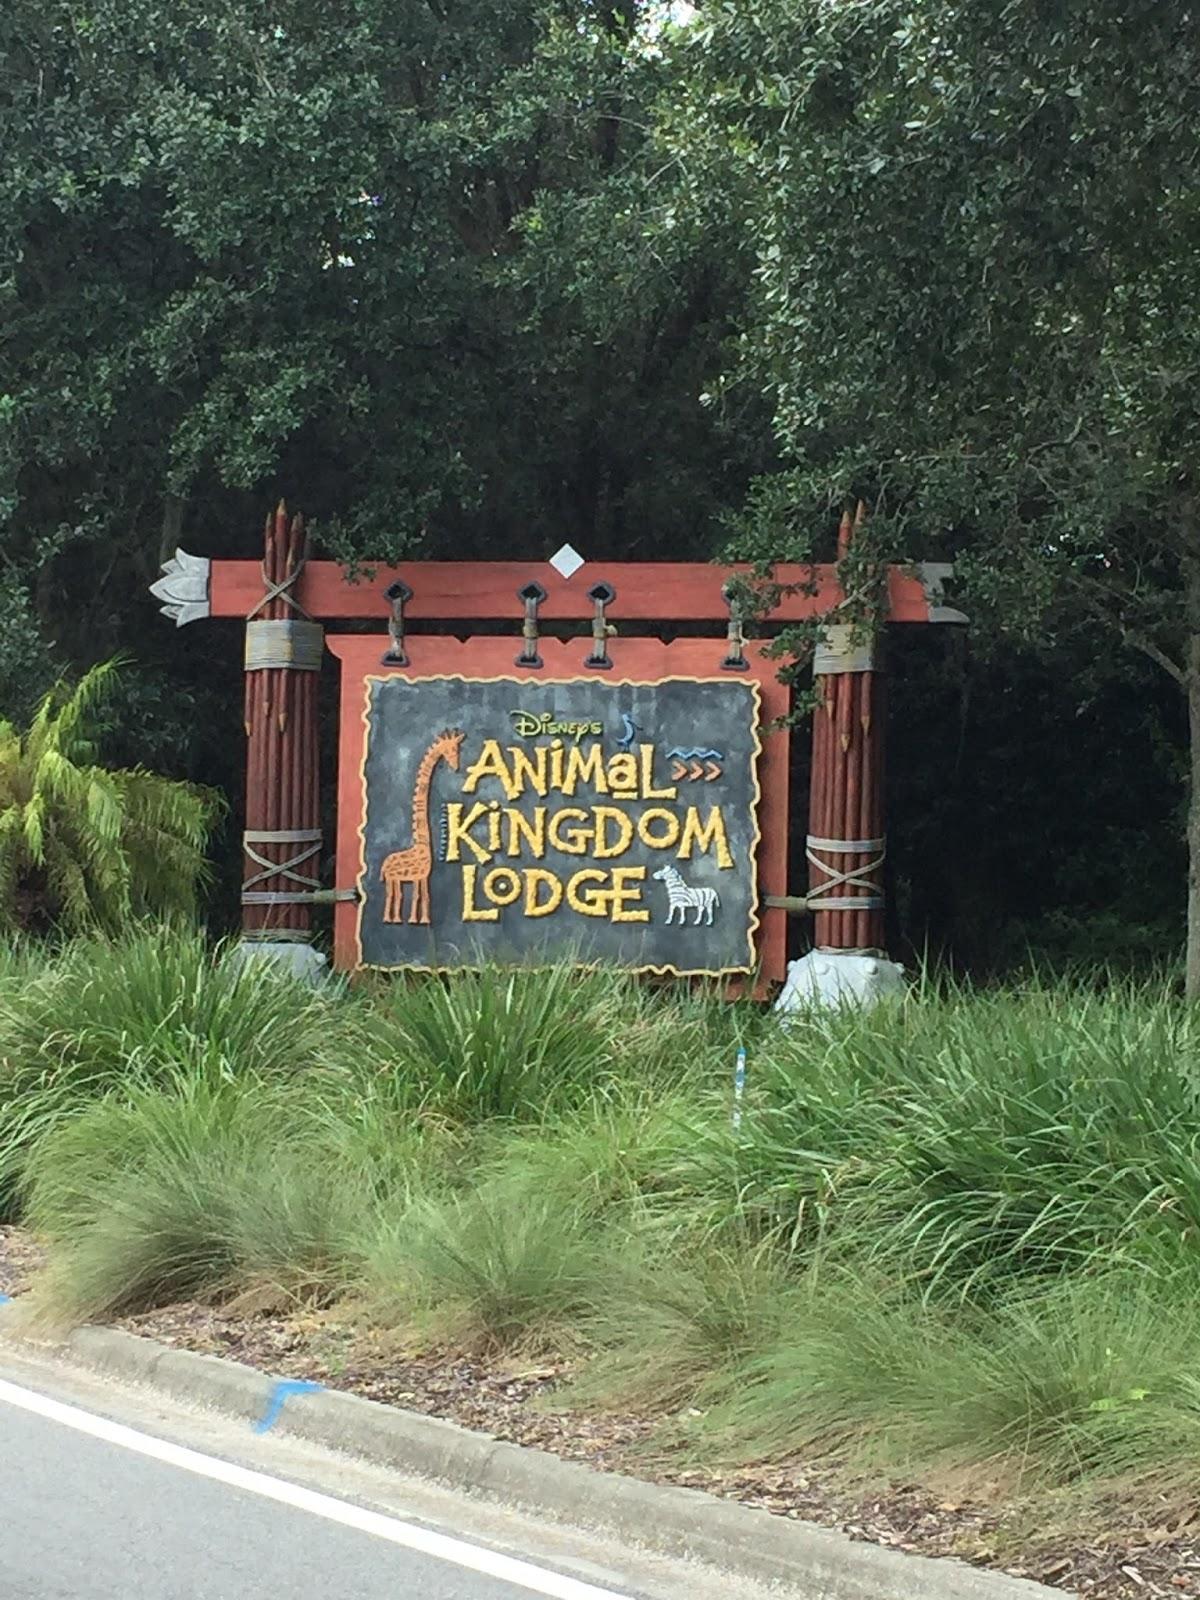 Visit to Animal Kingdom Lodge